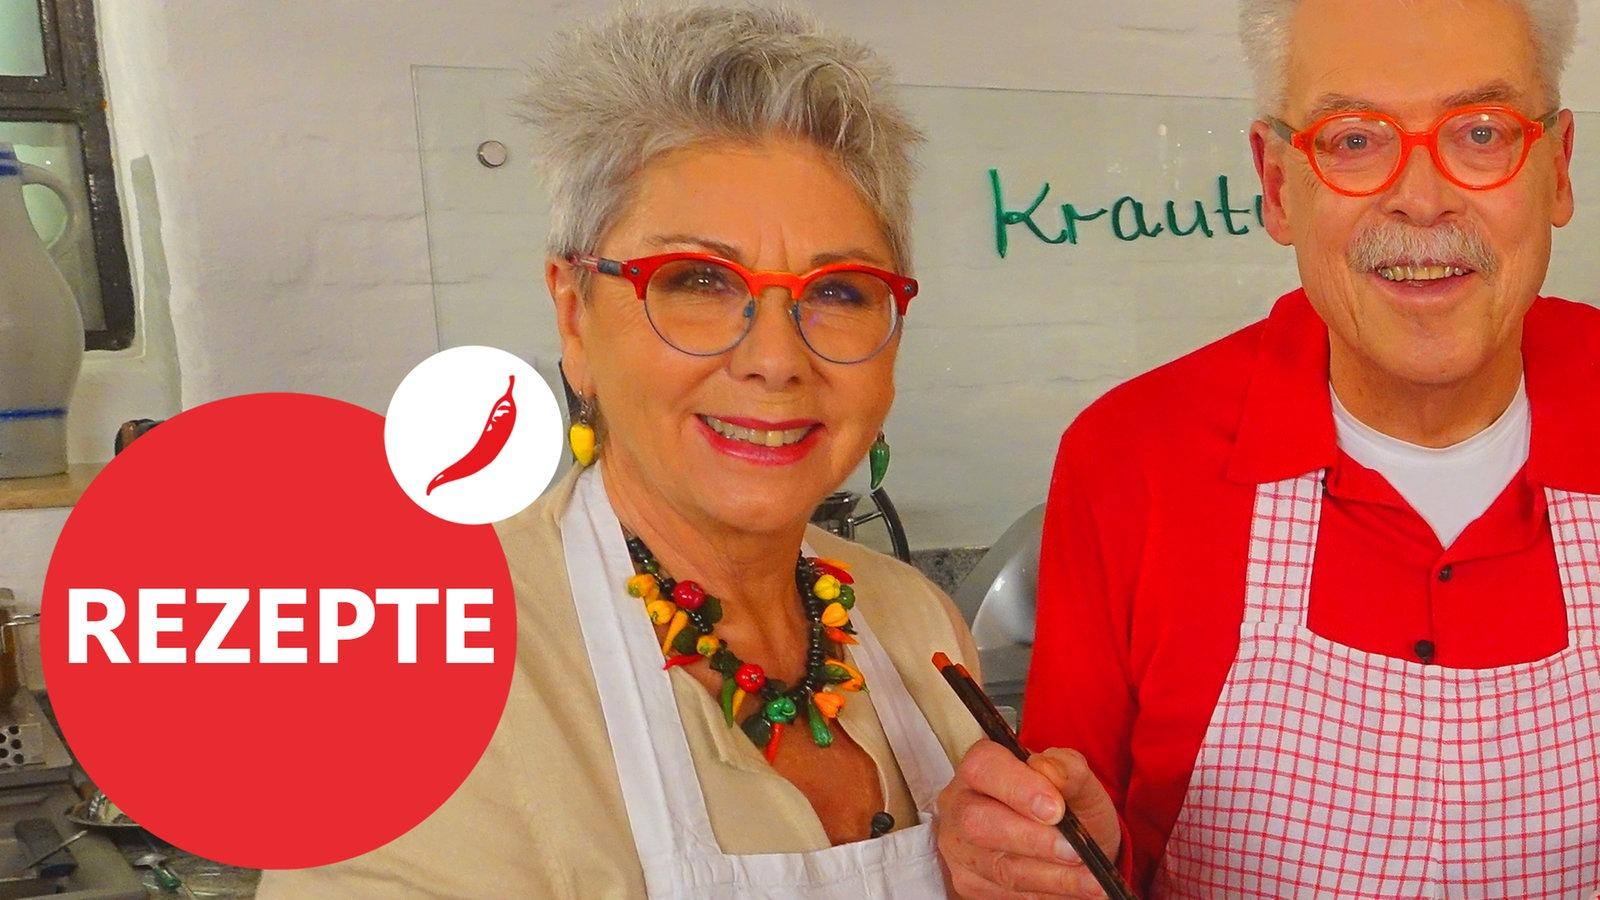 Gänsekeulen Rezept Martina Und Moritz